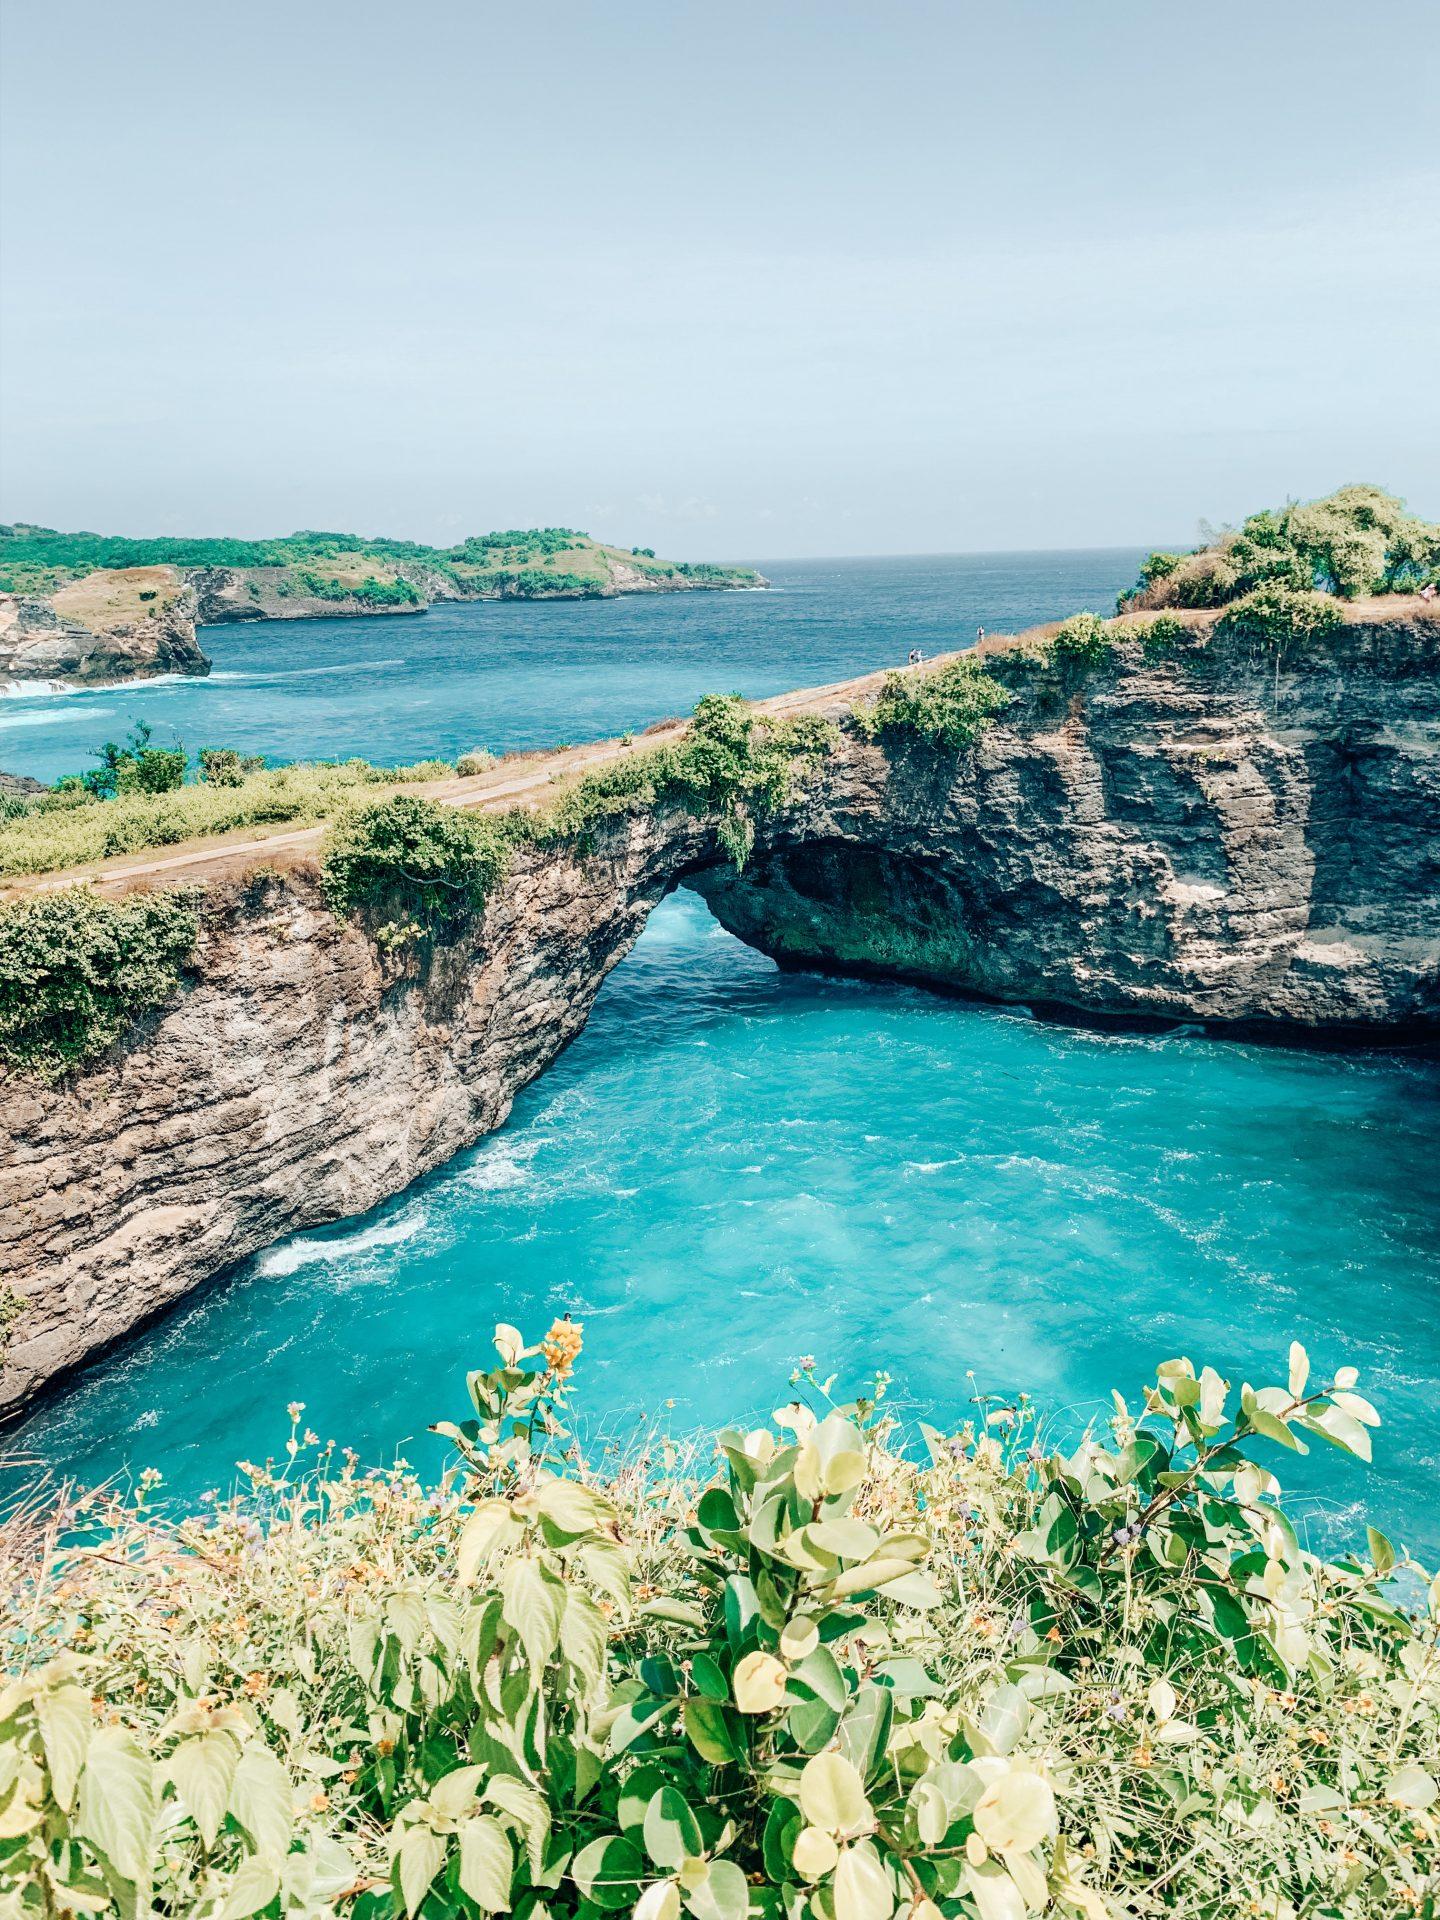 Broken Bridge archway on Nusa Penida island